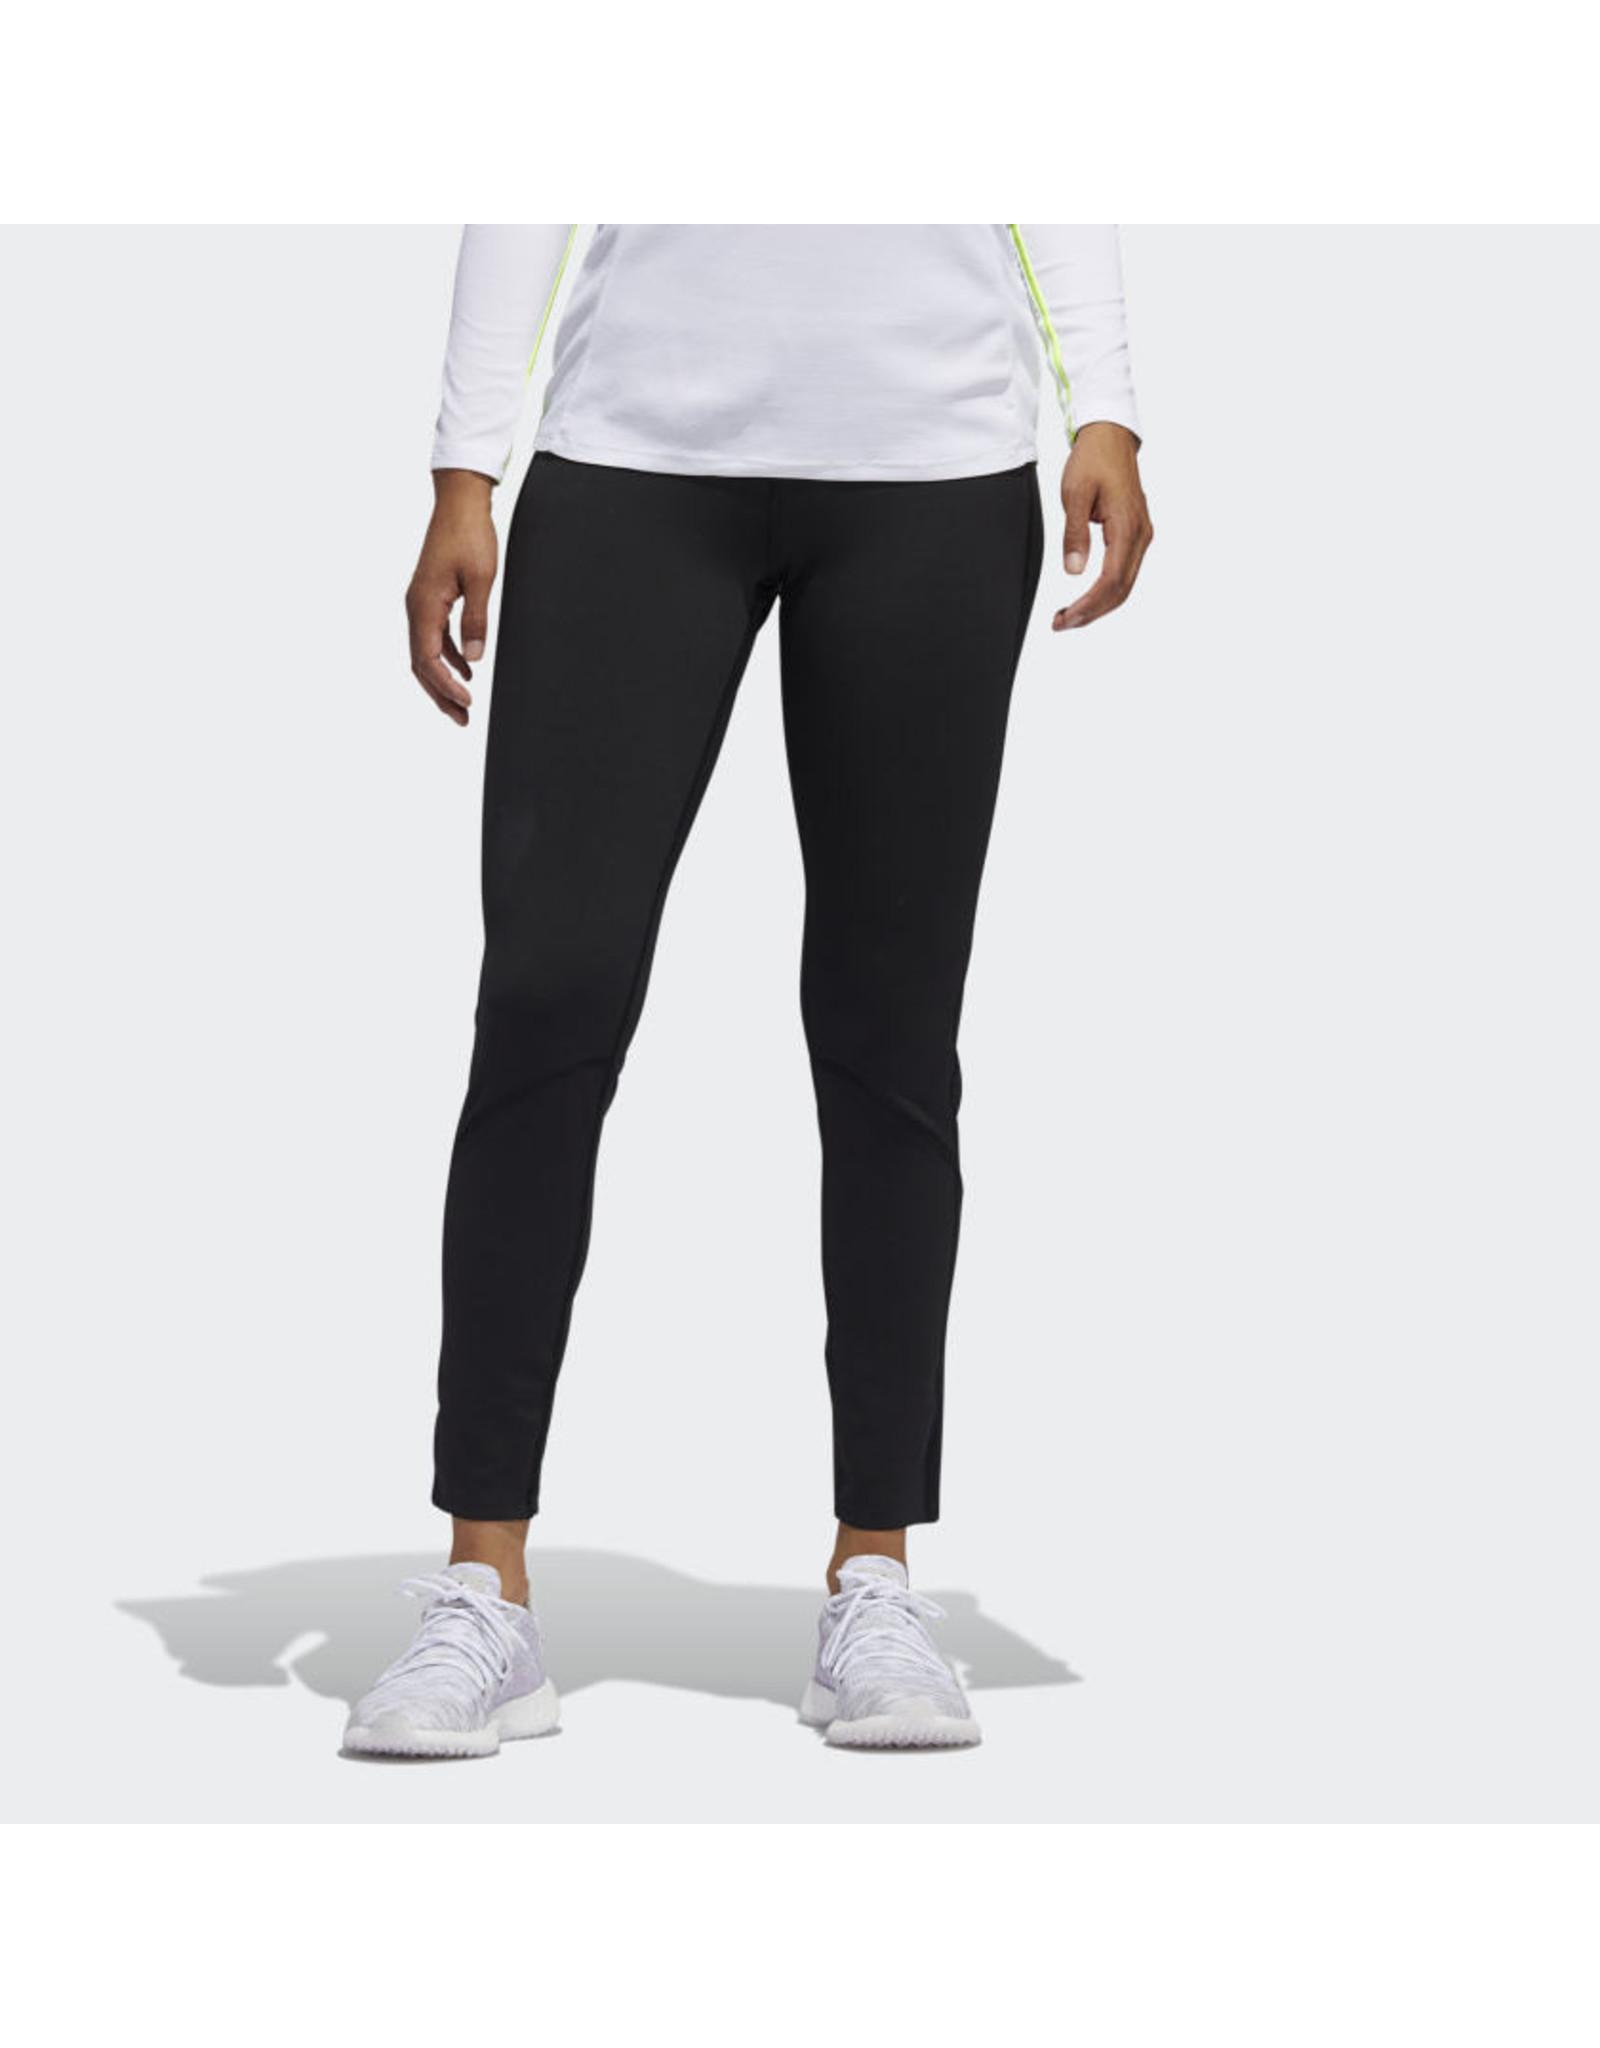 Adidas Adi Ladies UPF LEGNG